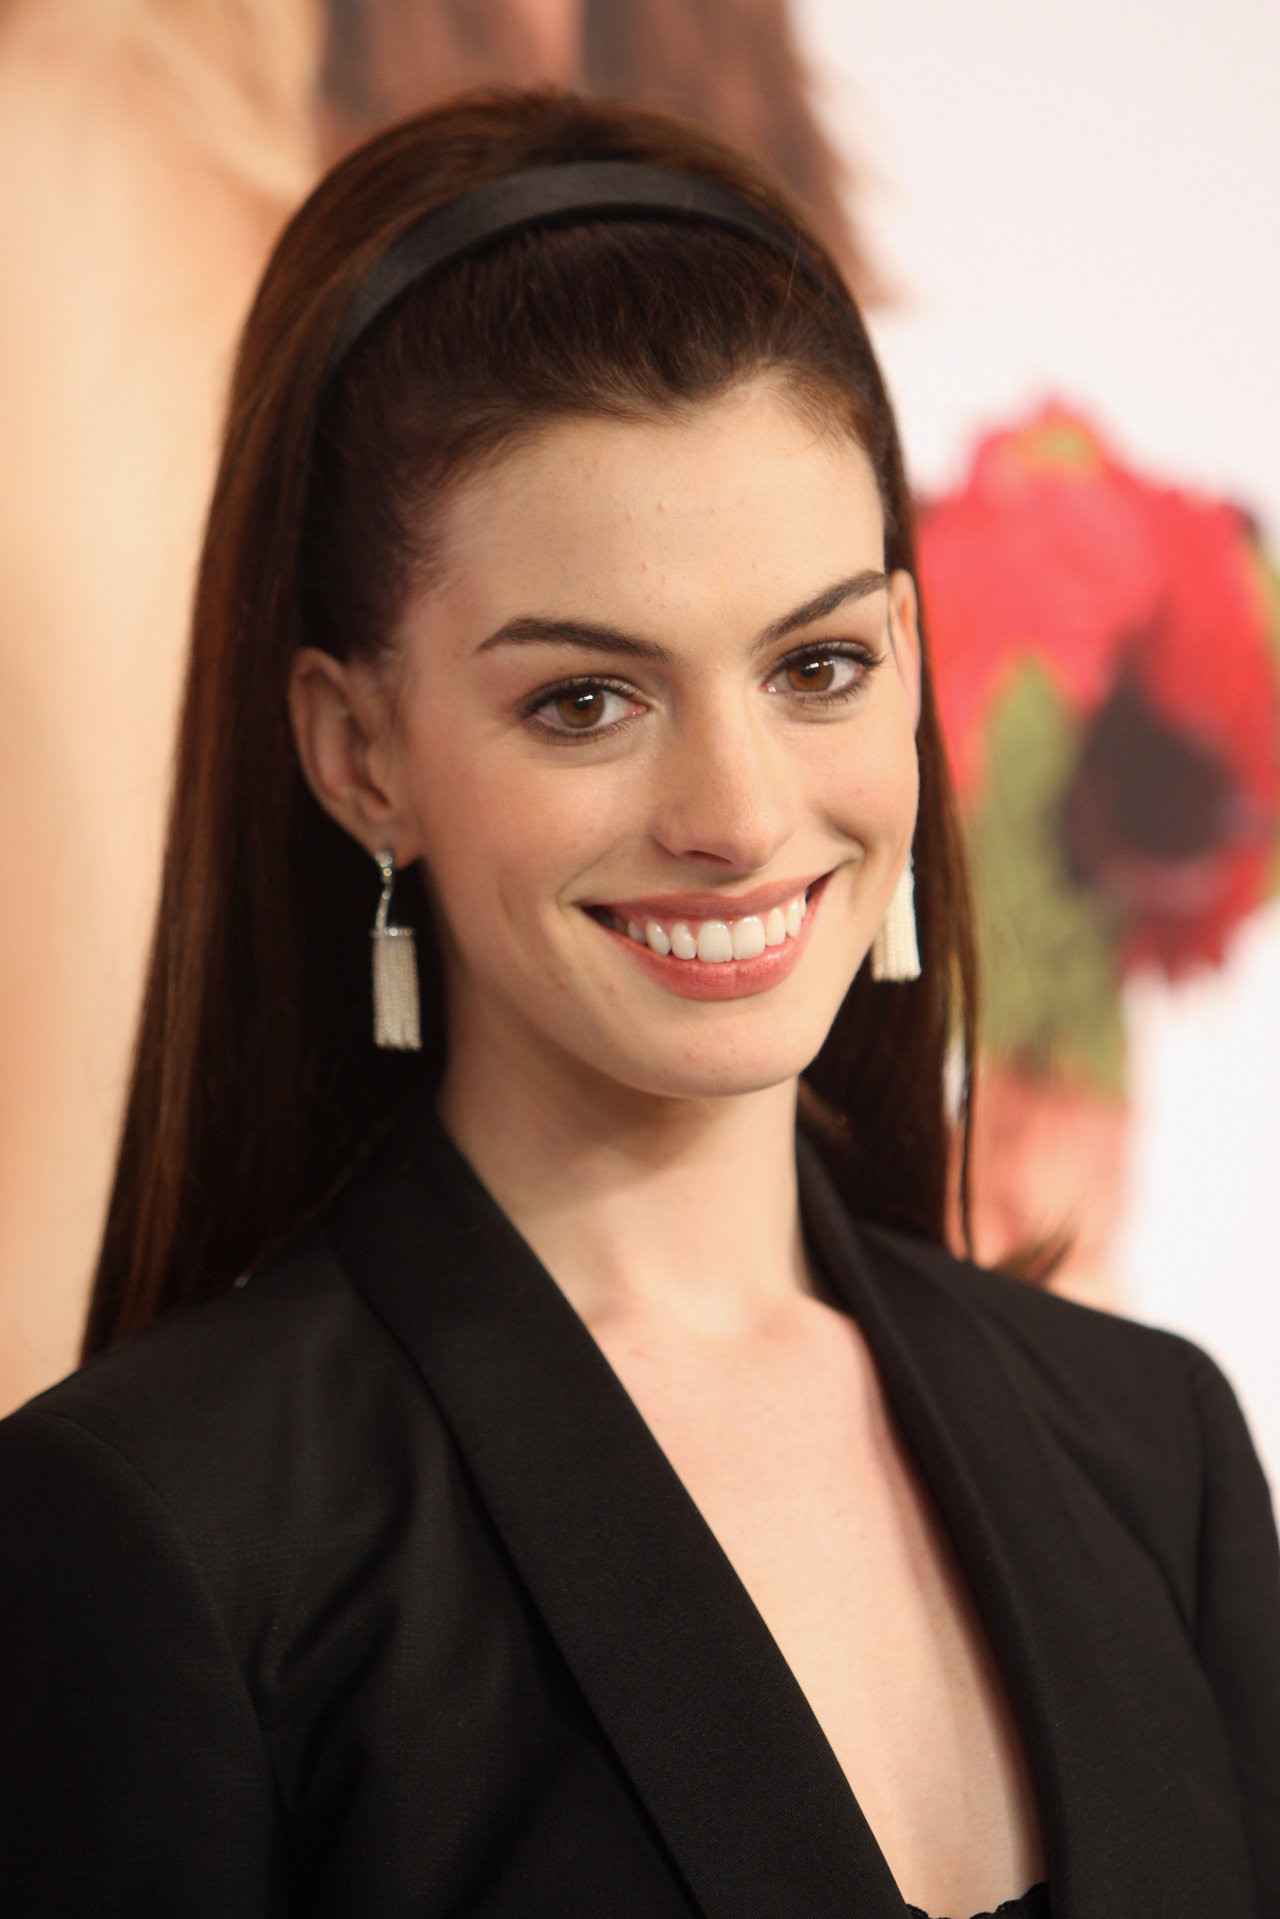 Anne Hathaway - Photos Hot